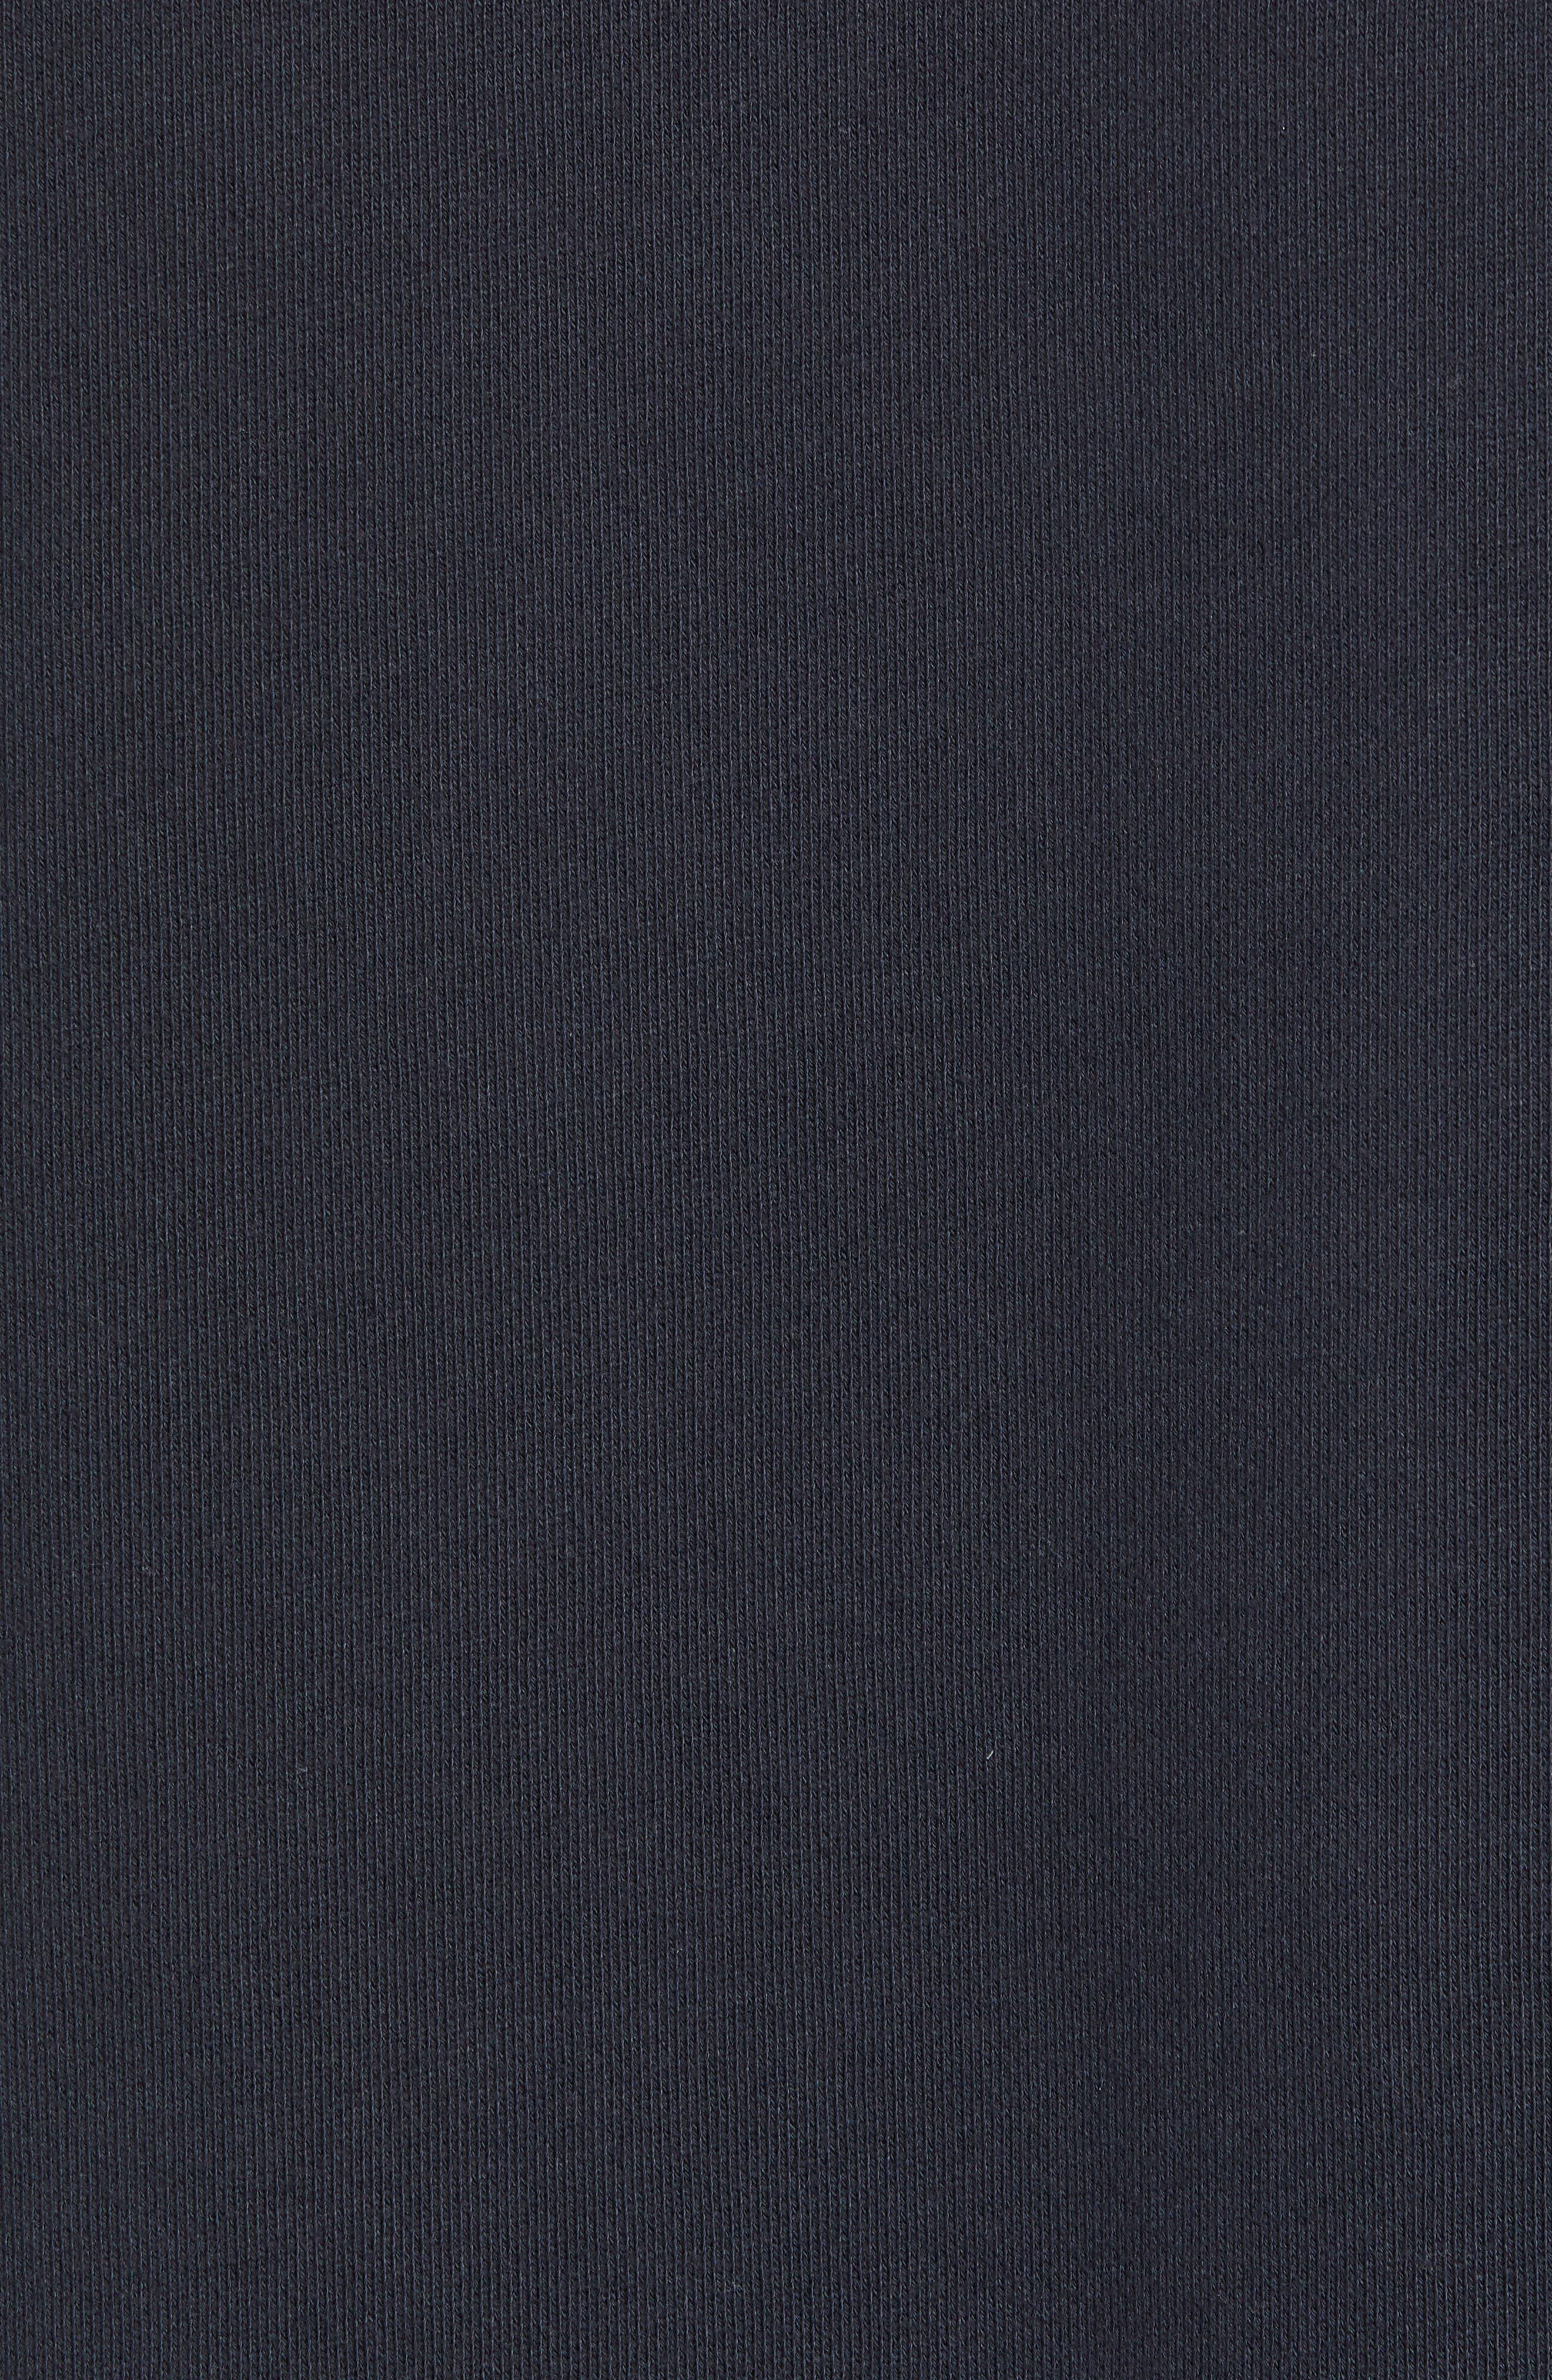 Regular Fit Crewneck Pullover,                             Alternate thumbnail 5, color,                             NAVY